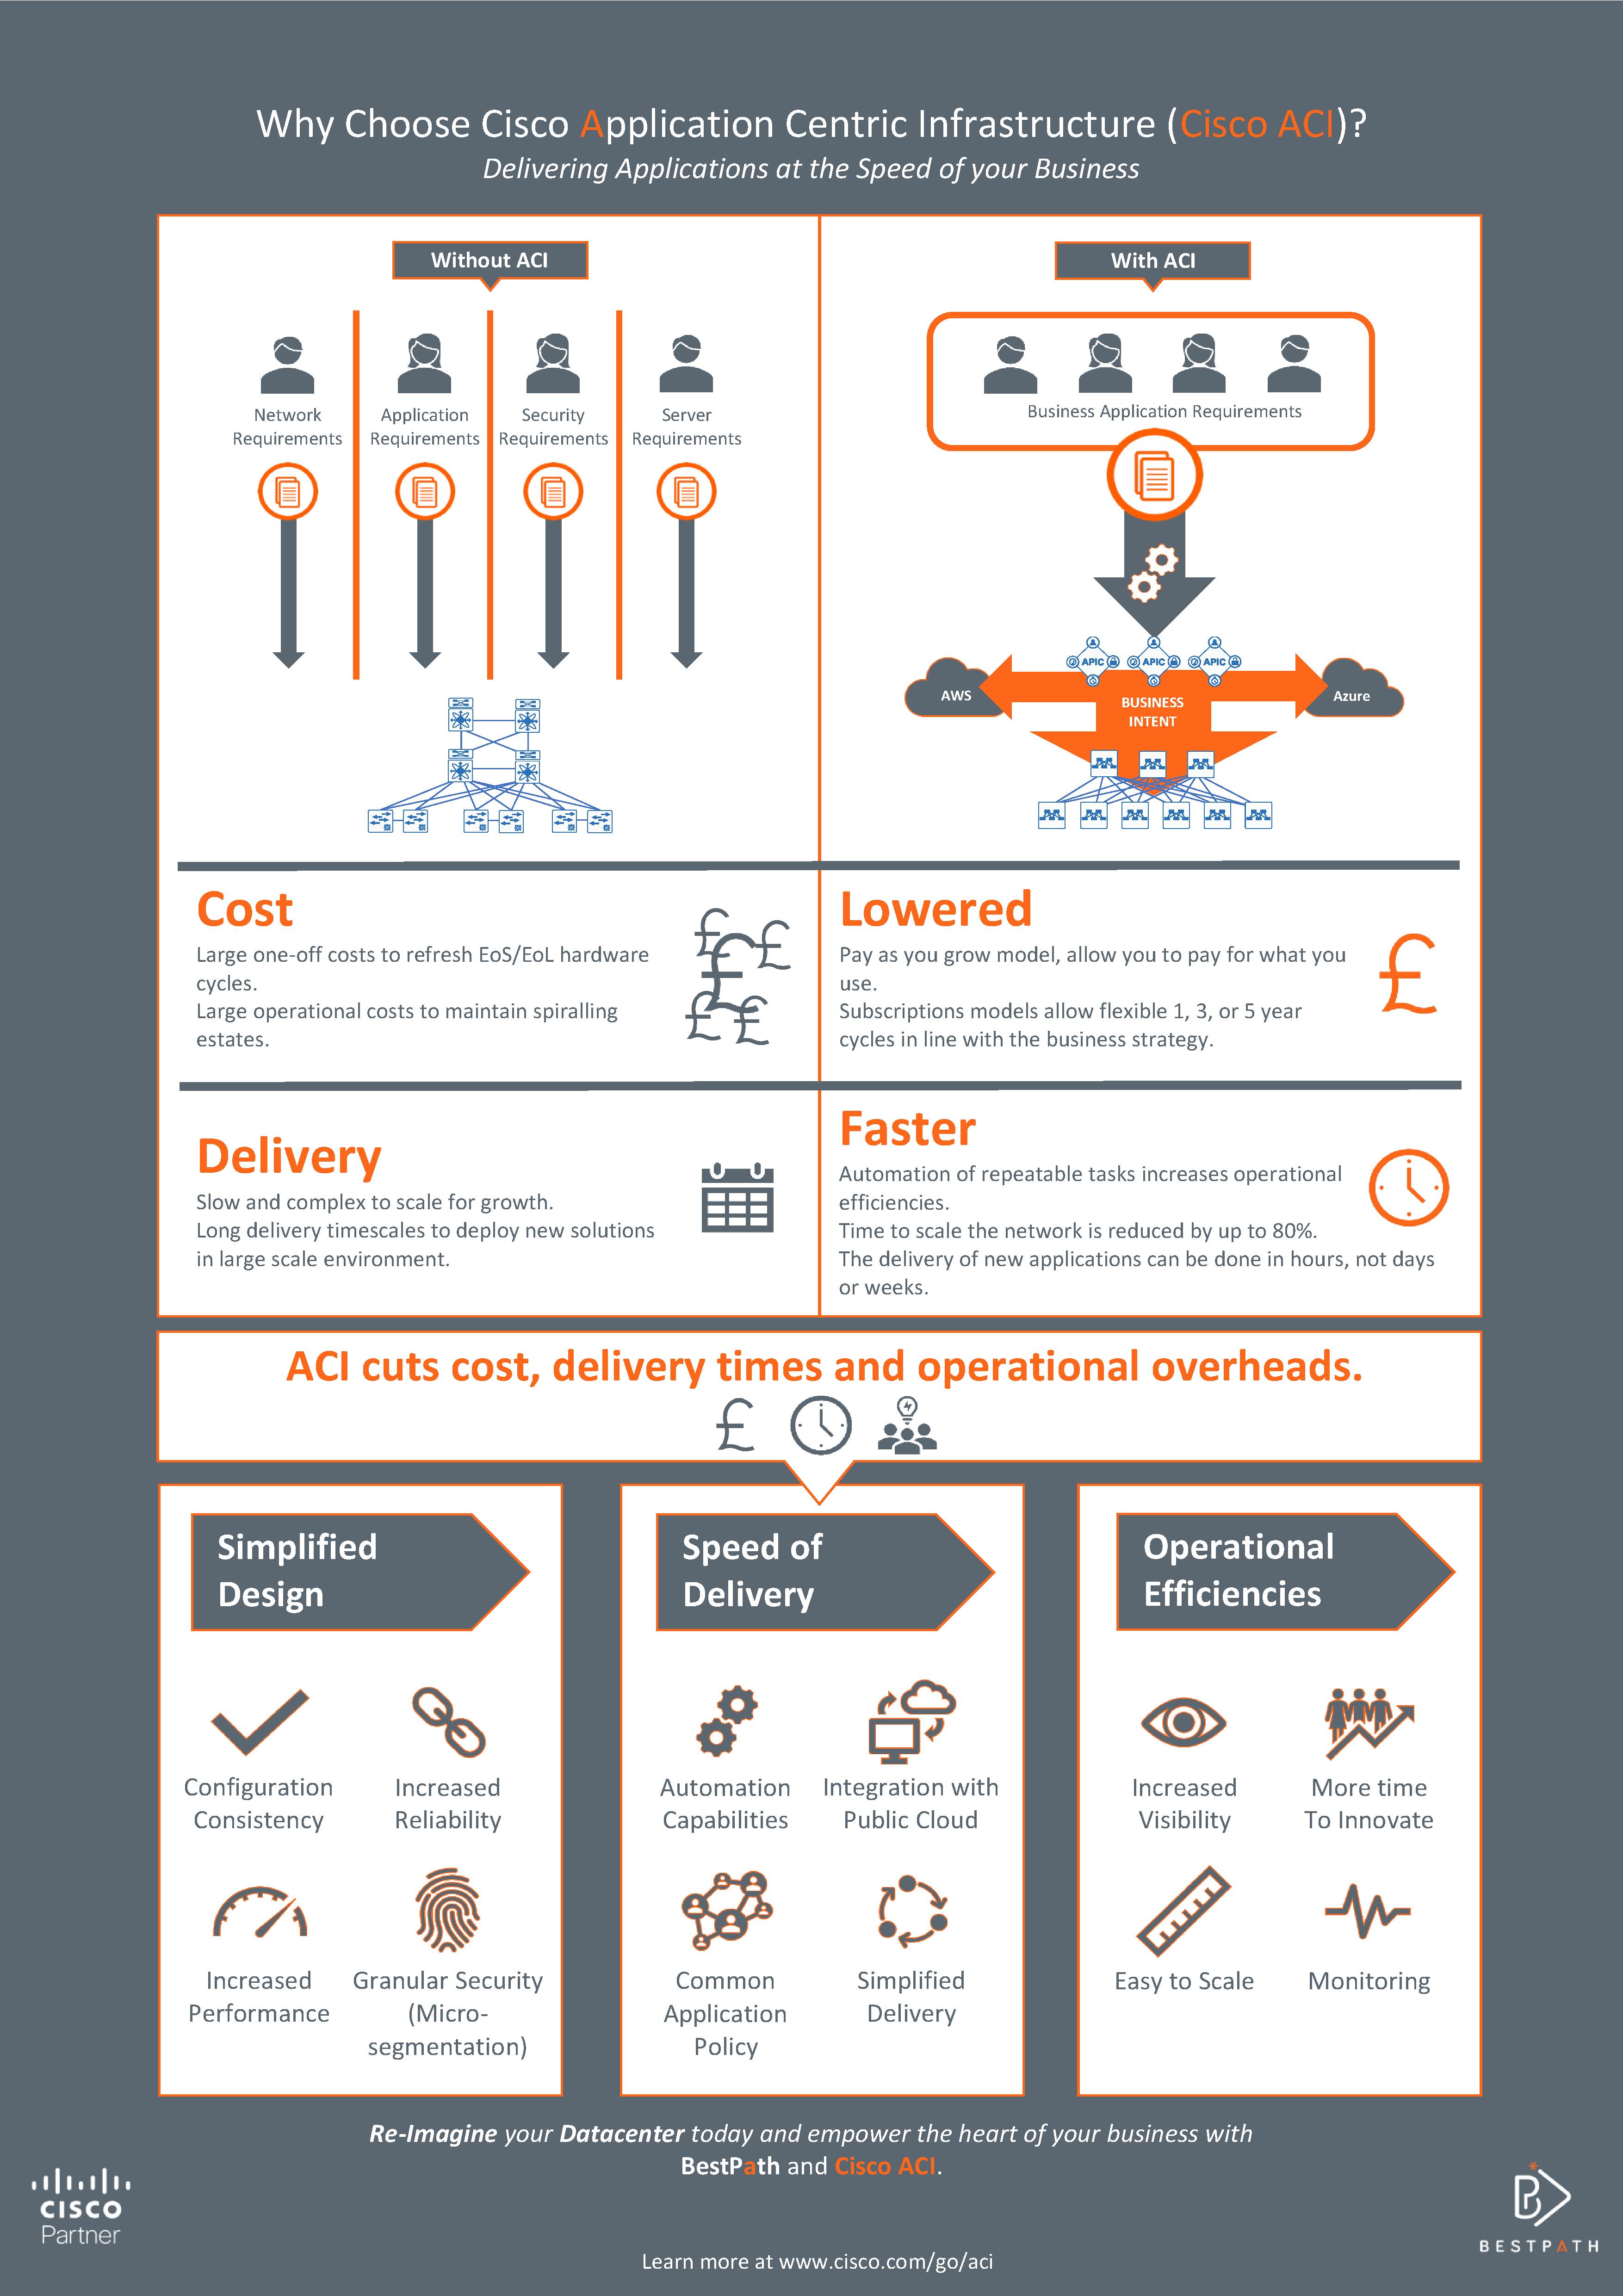 BestPath Cisco ACI Infographic